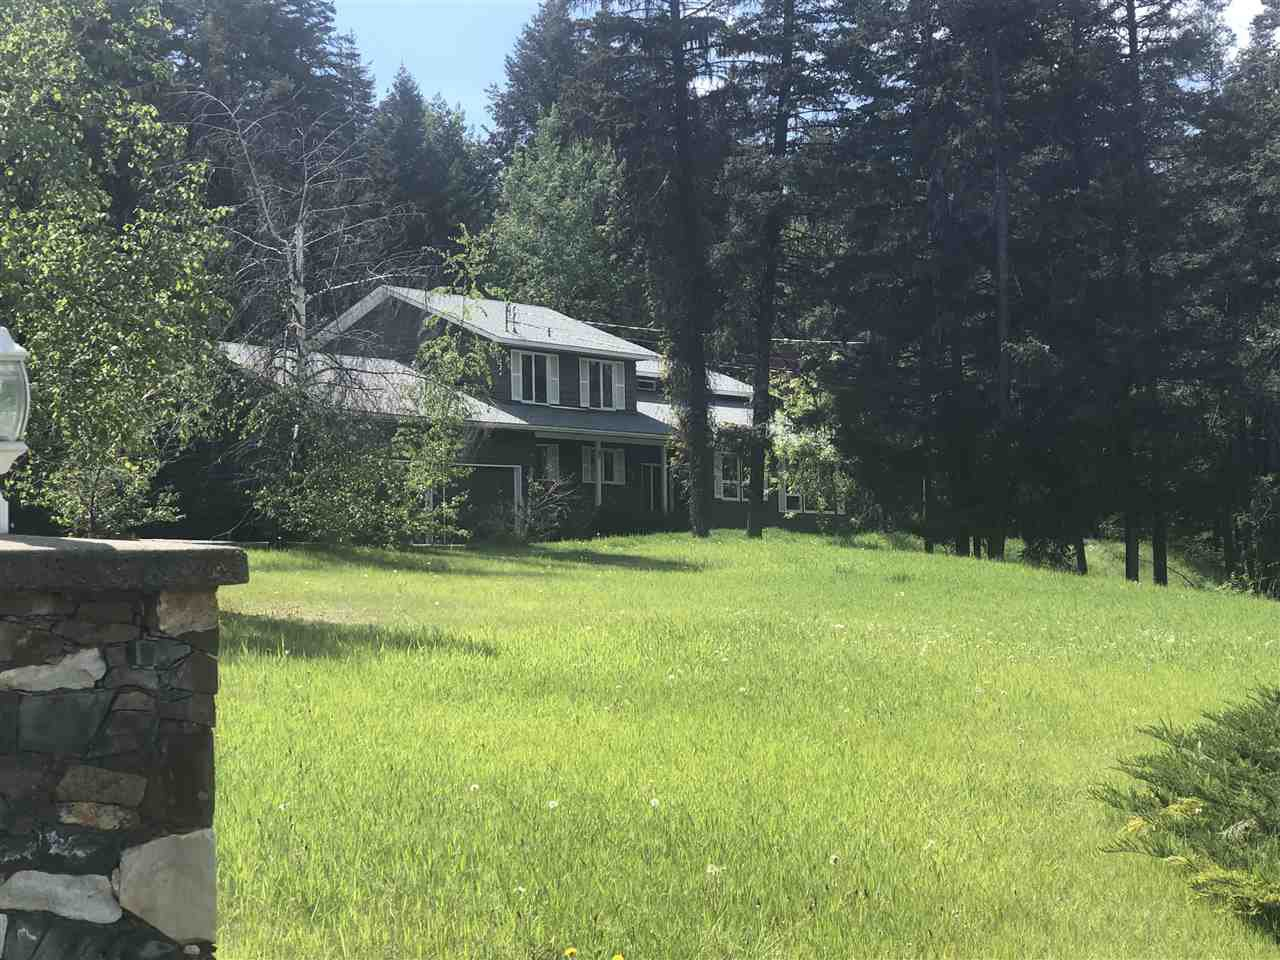 Main Photo: 569 ROBERTS Drive in Williams Lake: Esler/Dog Creek House for sale (Williams Lake (Zone 27))  : MLS®# R2332444